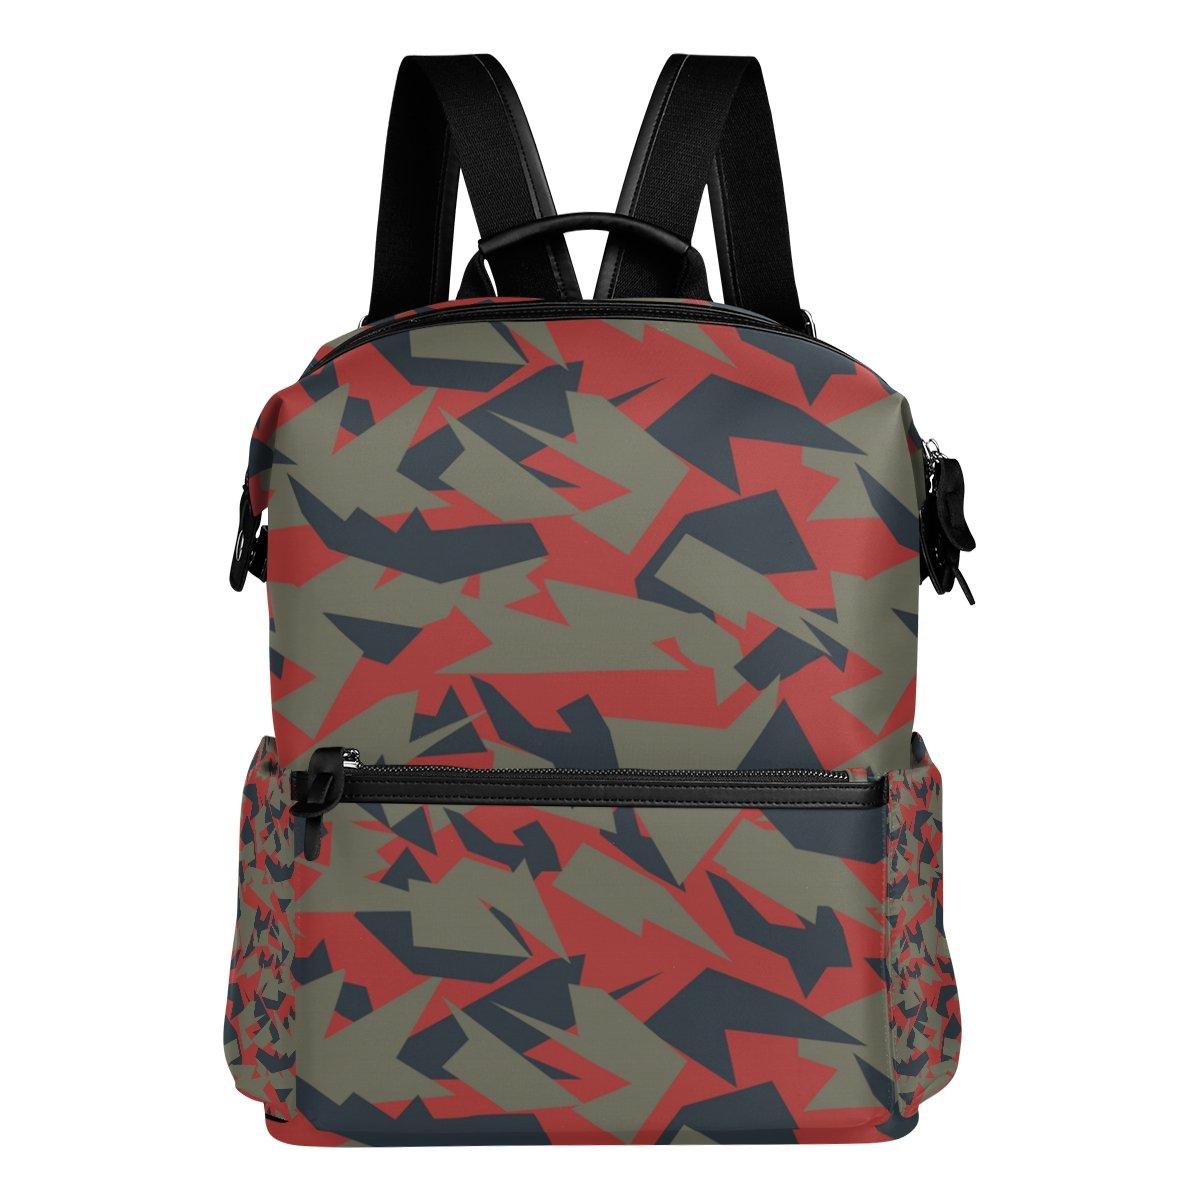 COOSUN Camuflaje Escuela Escuela Escuela Militar Texturas Mochila mochila de viaje Multi 7764c7